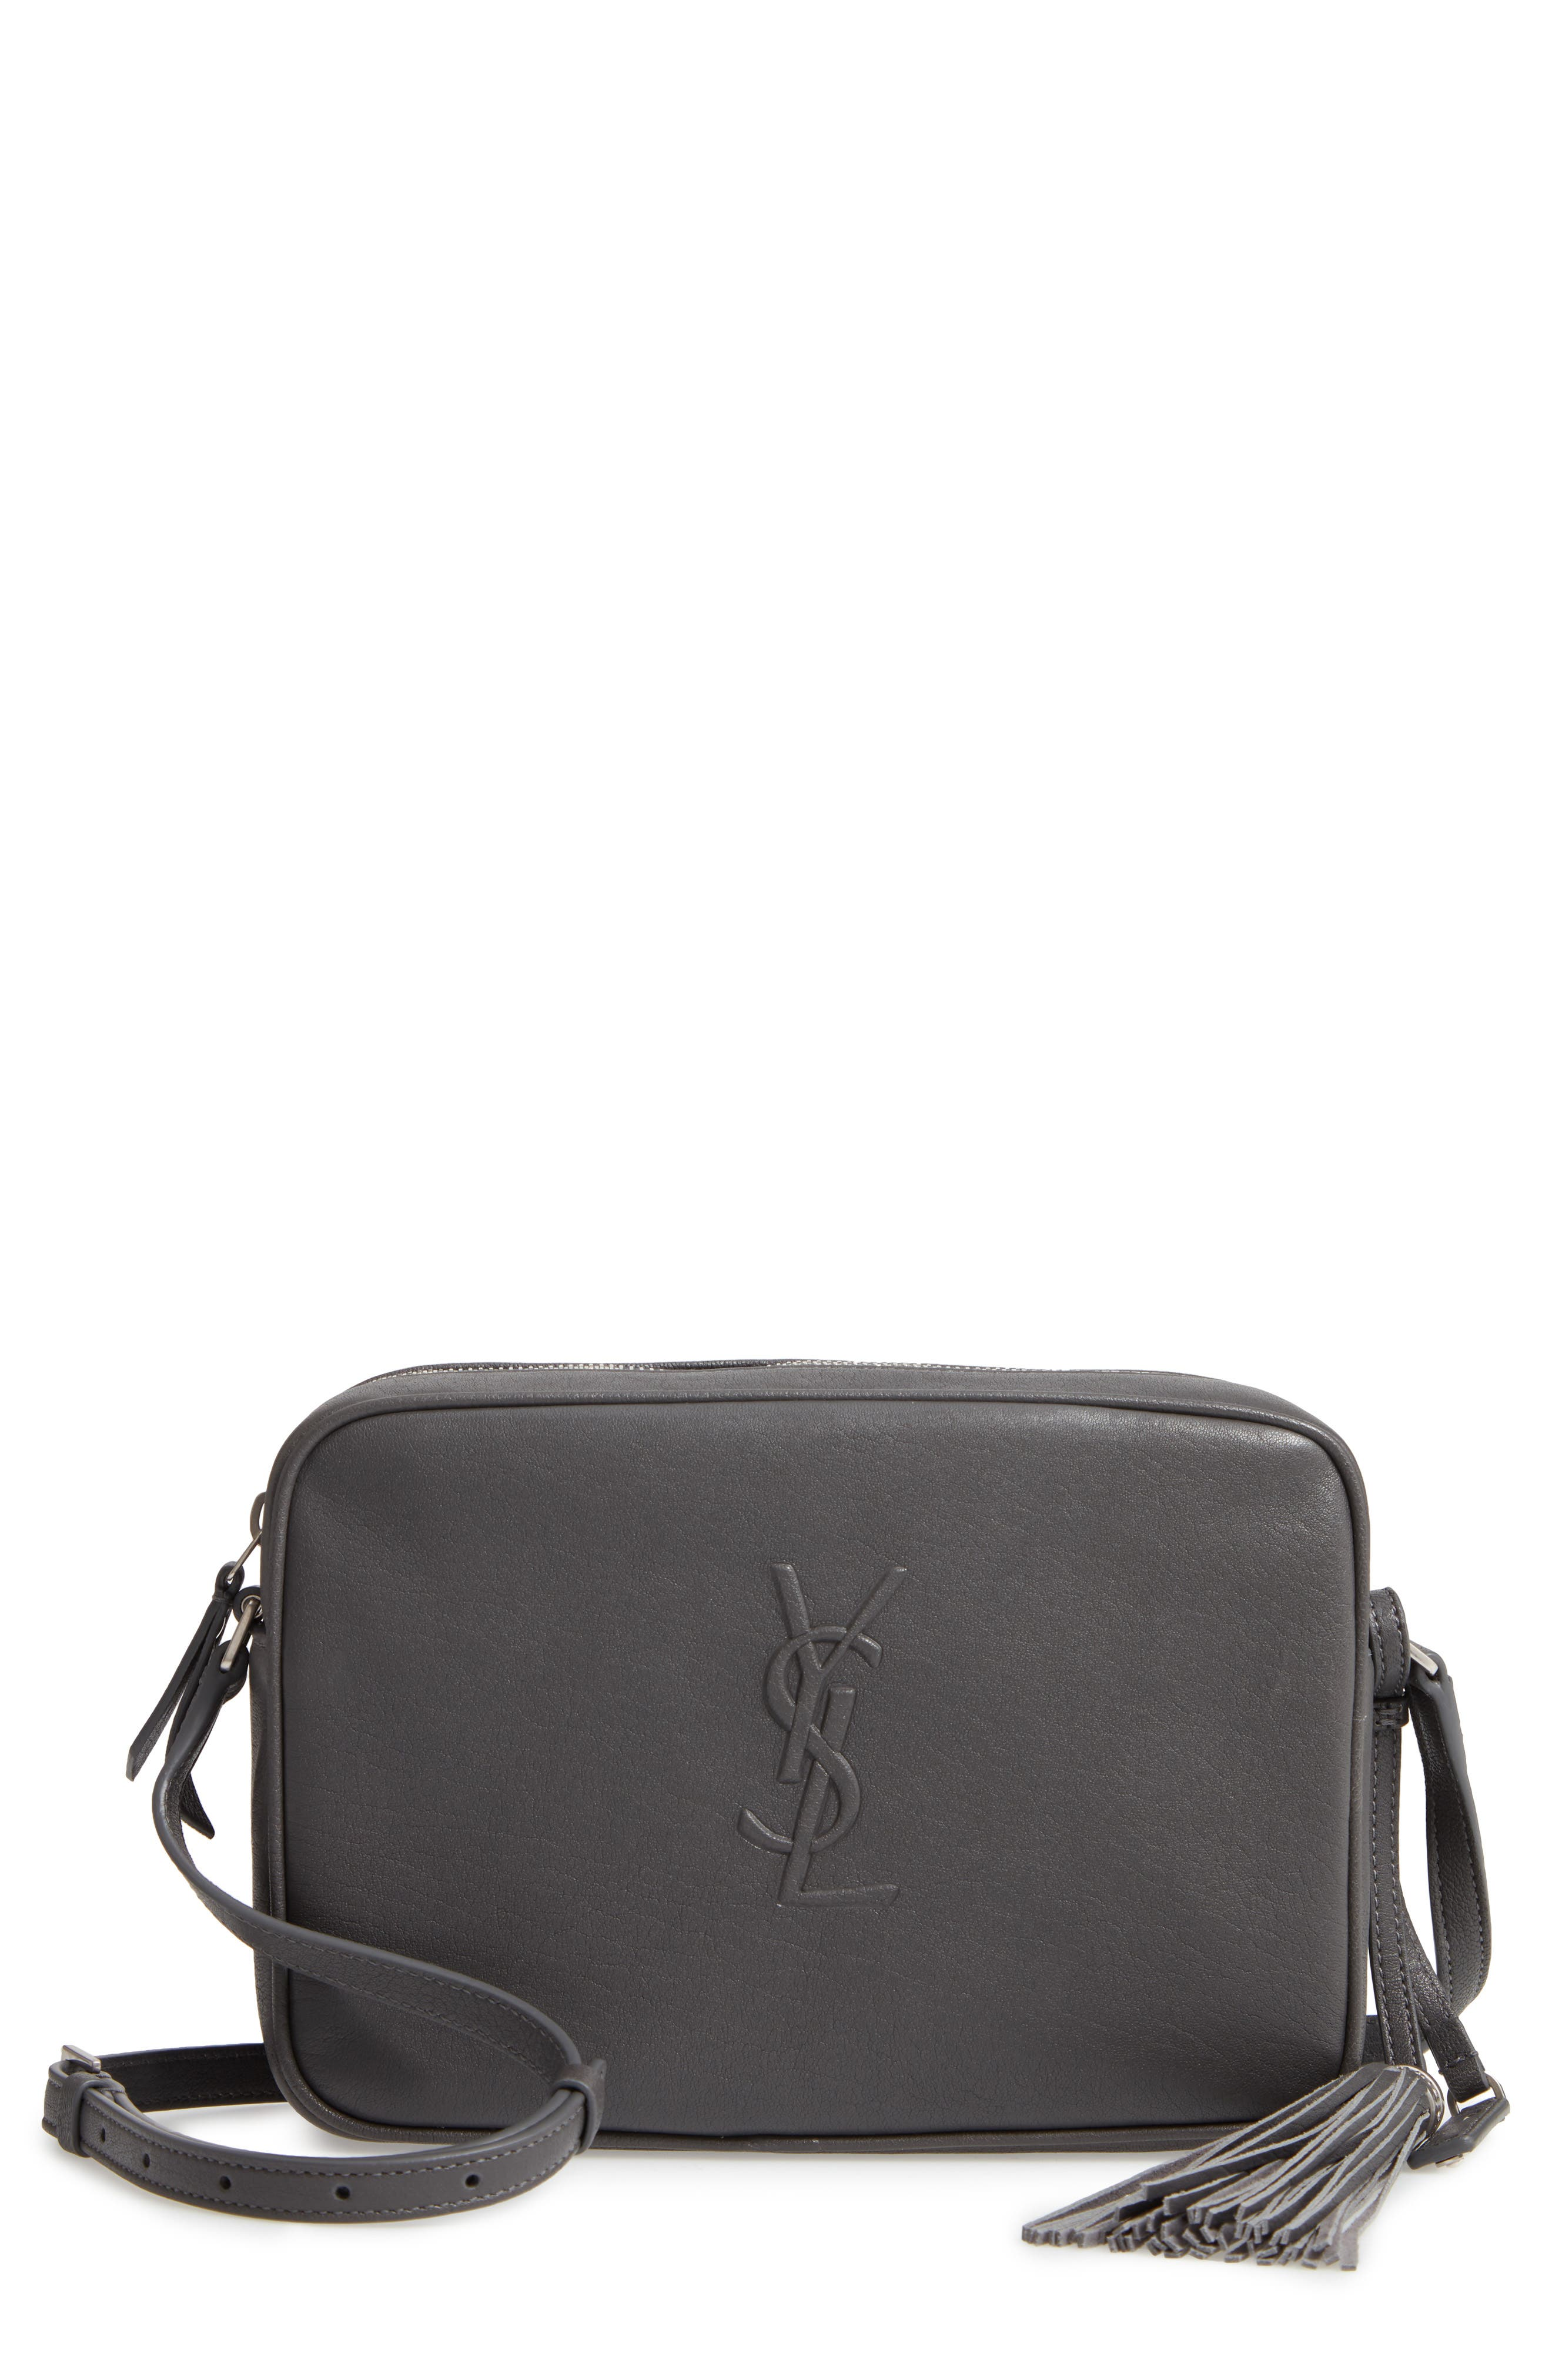 SAINT LAURENT Small Mono Leather Camera Bag, Main, color, STORM